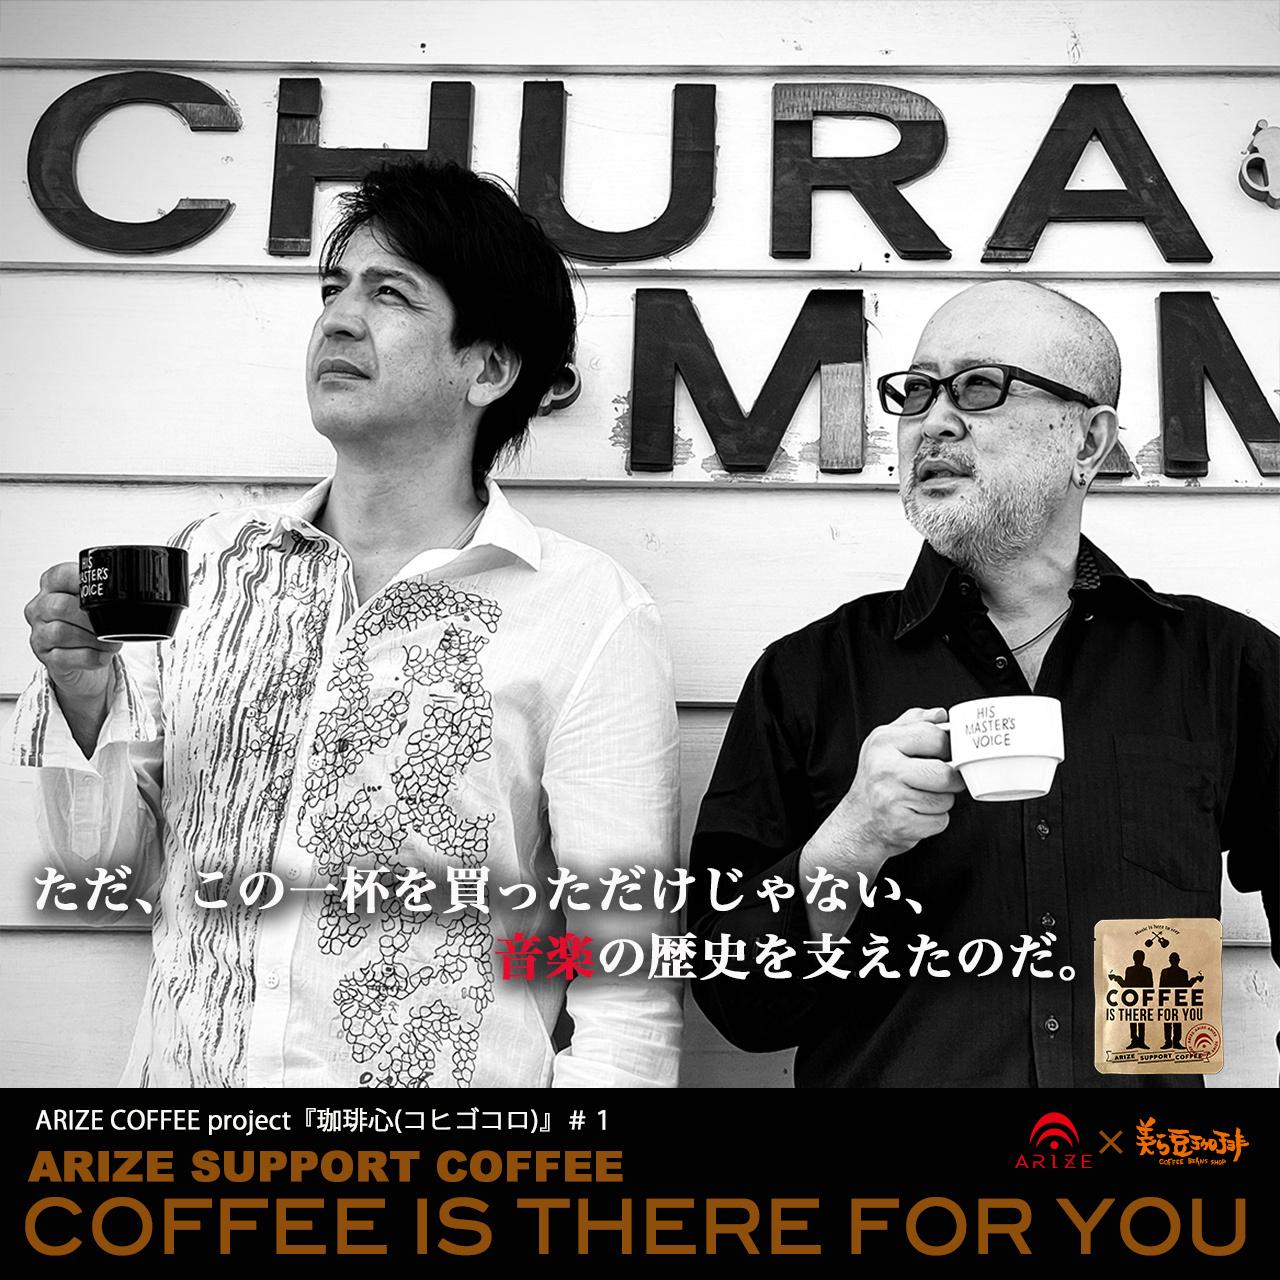 ARIZE COFFEE project『珈琲心(コヒゴコロ)』♯1